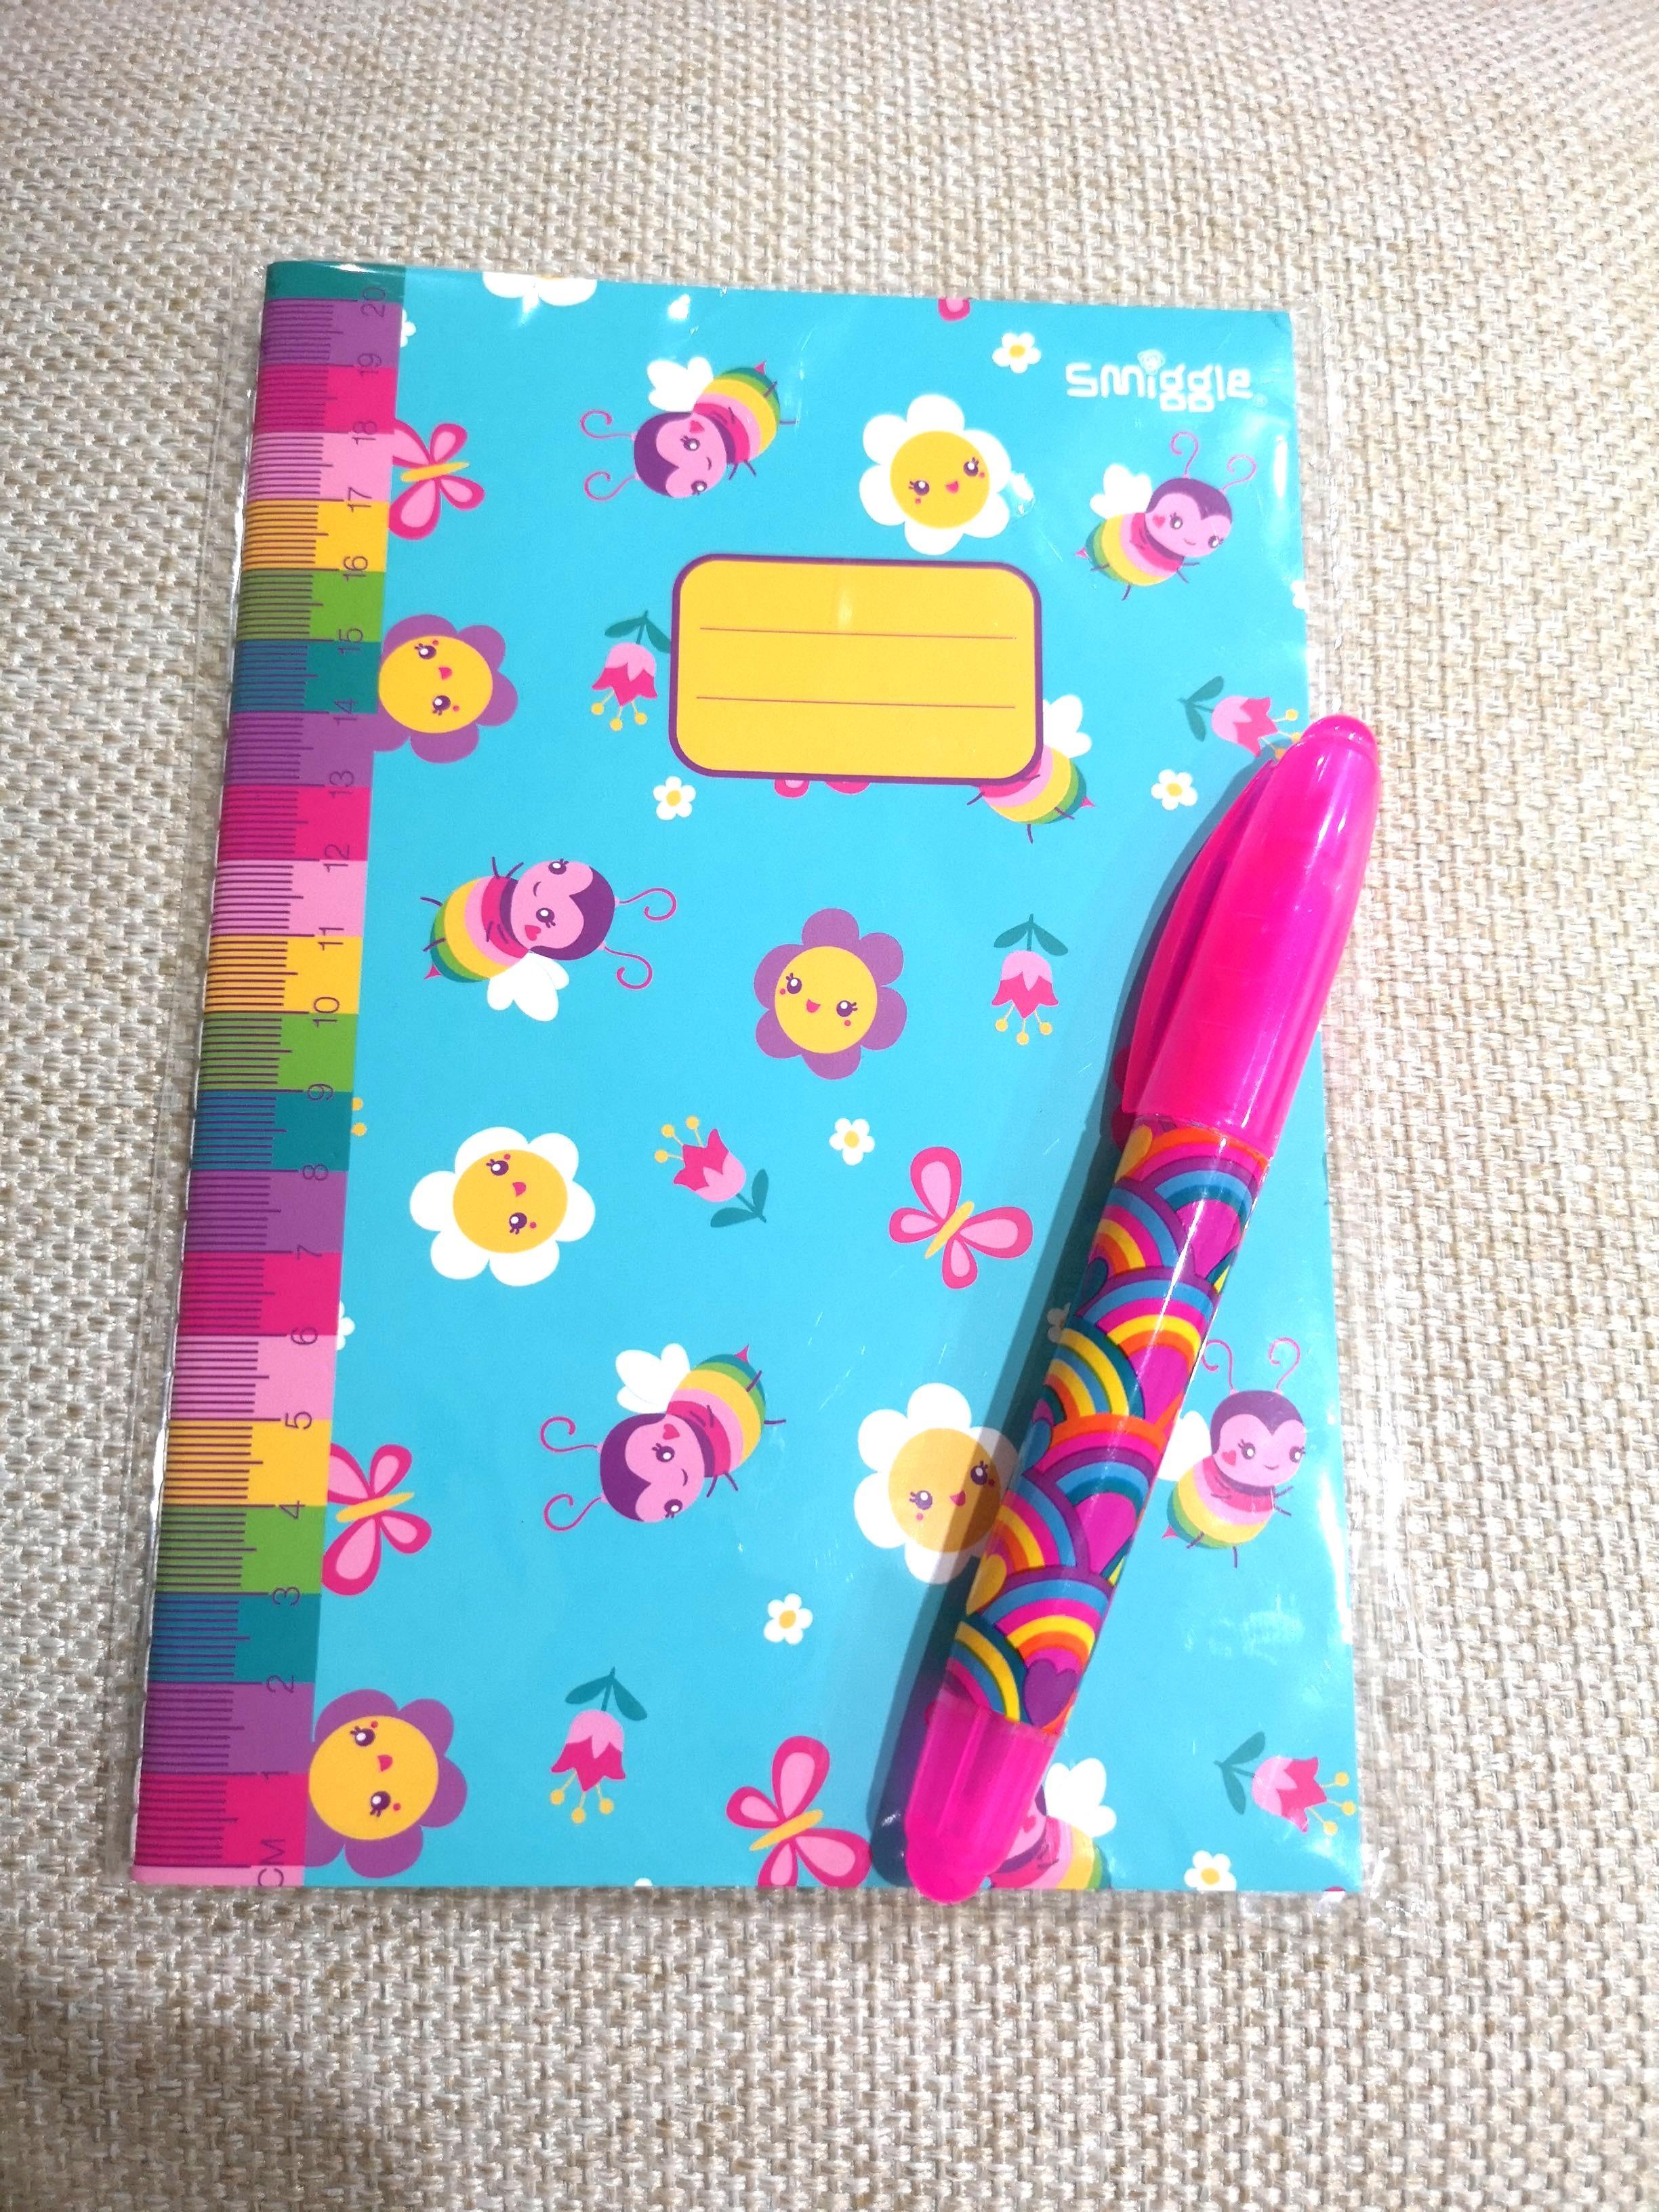 🌈SMIGGLE Note book + Highlighter Pen